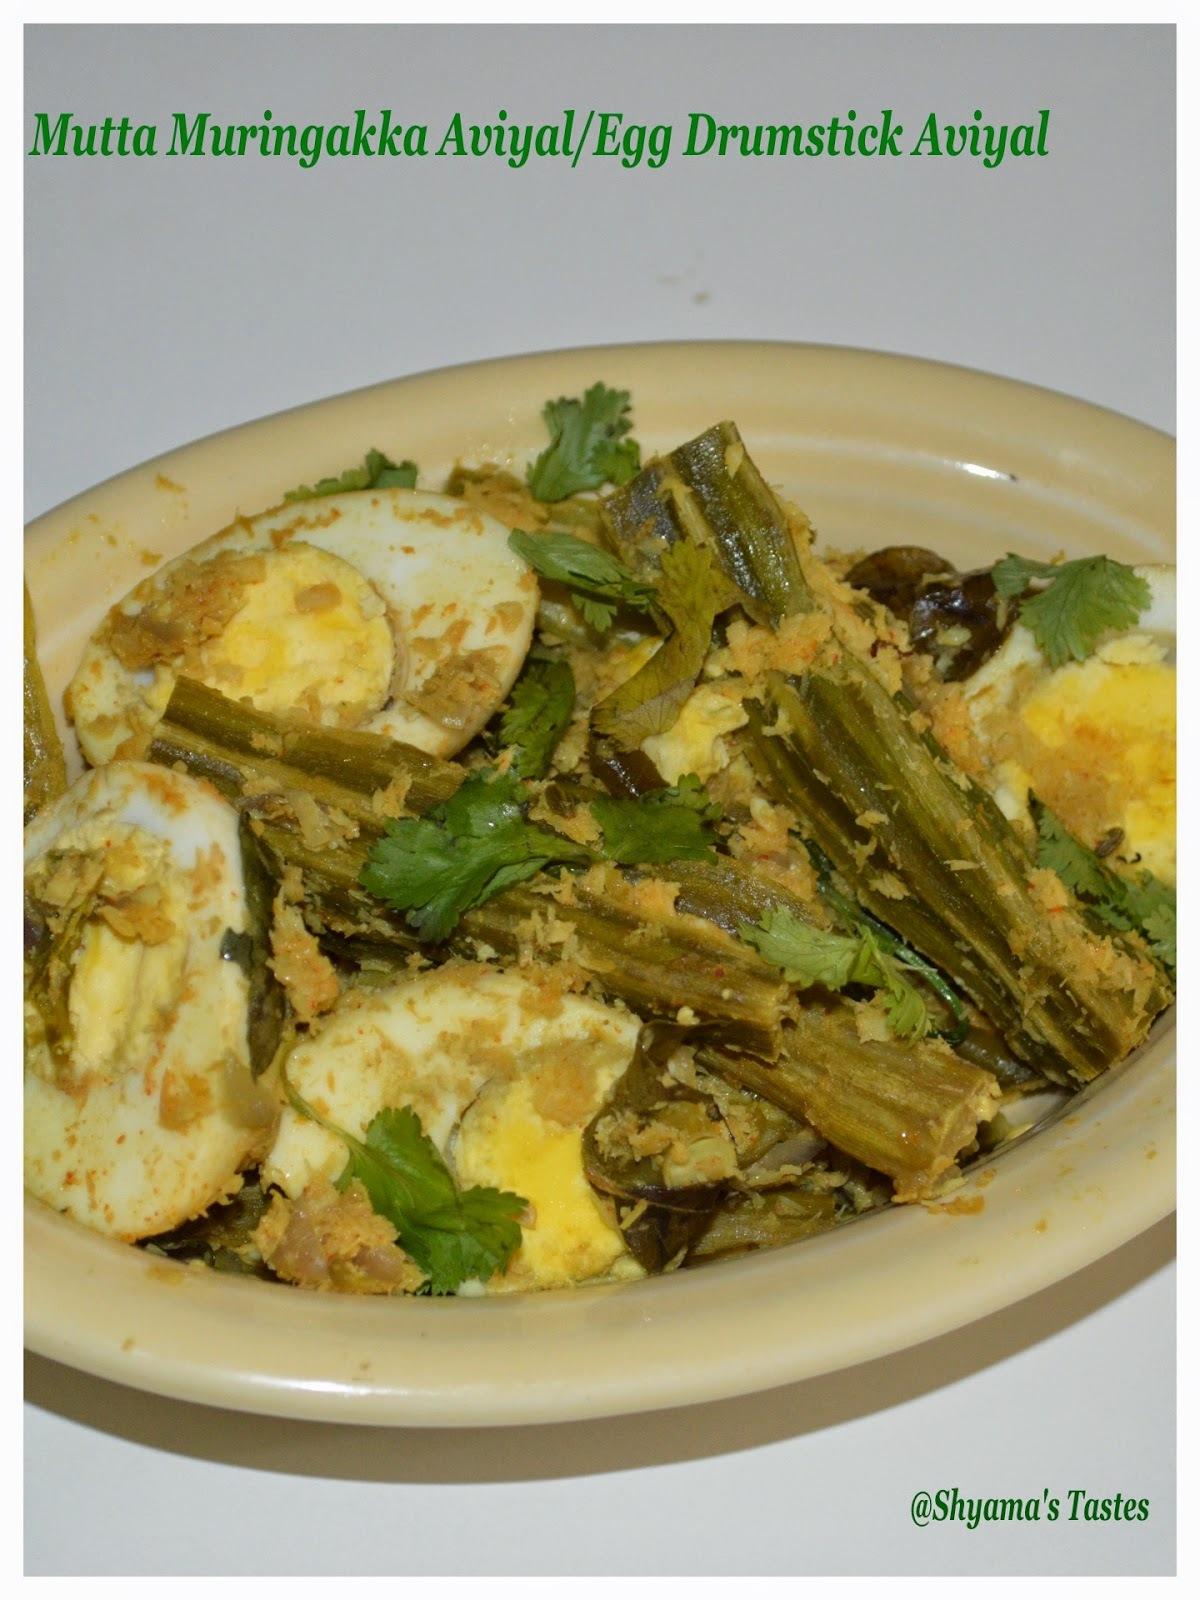 Egg-Drumstick Aviyal/Mutta-Muringakka Aviyal